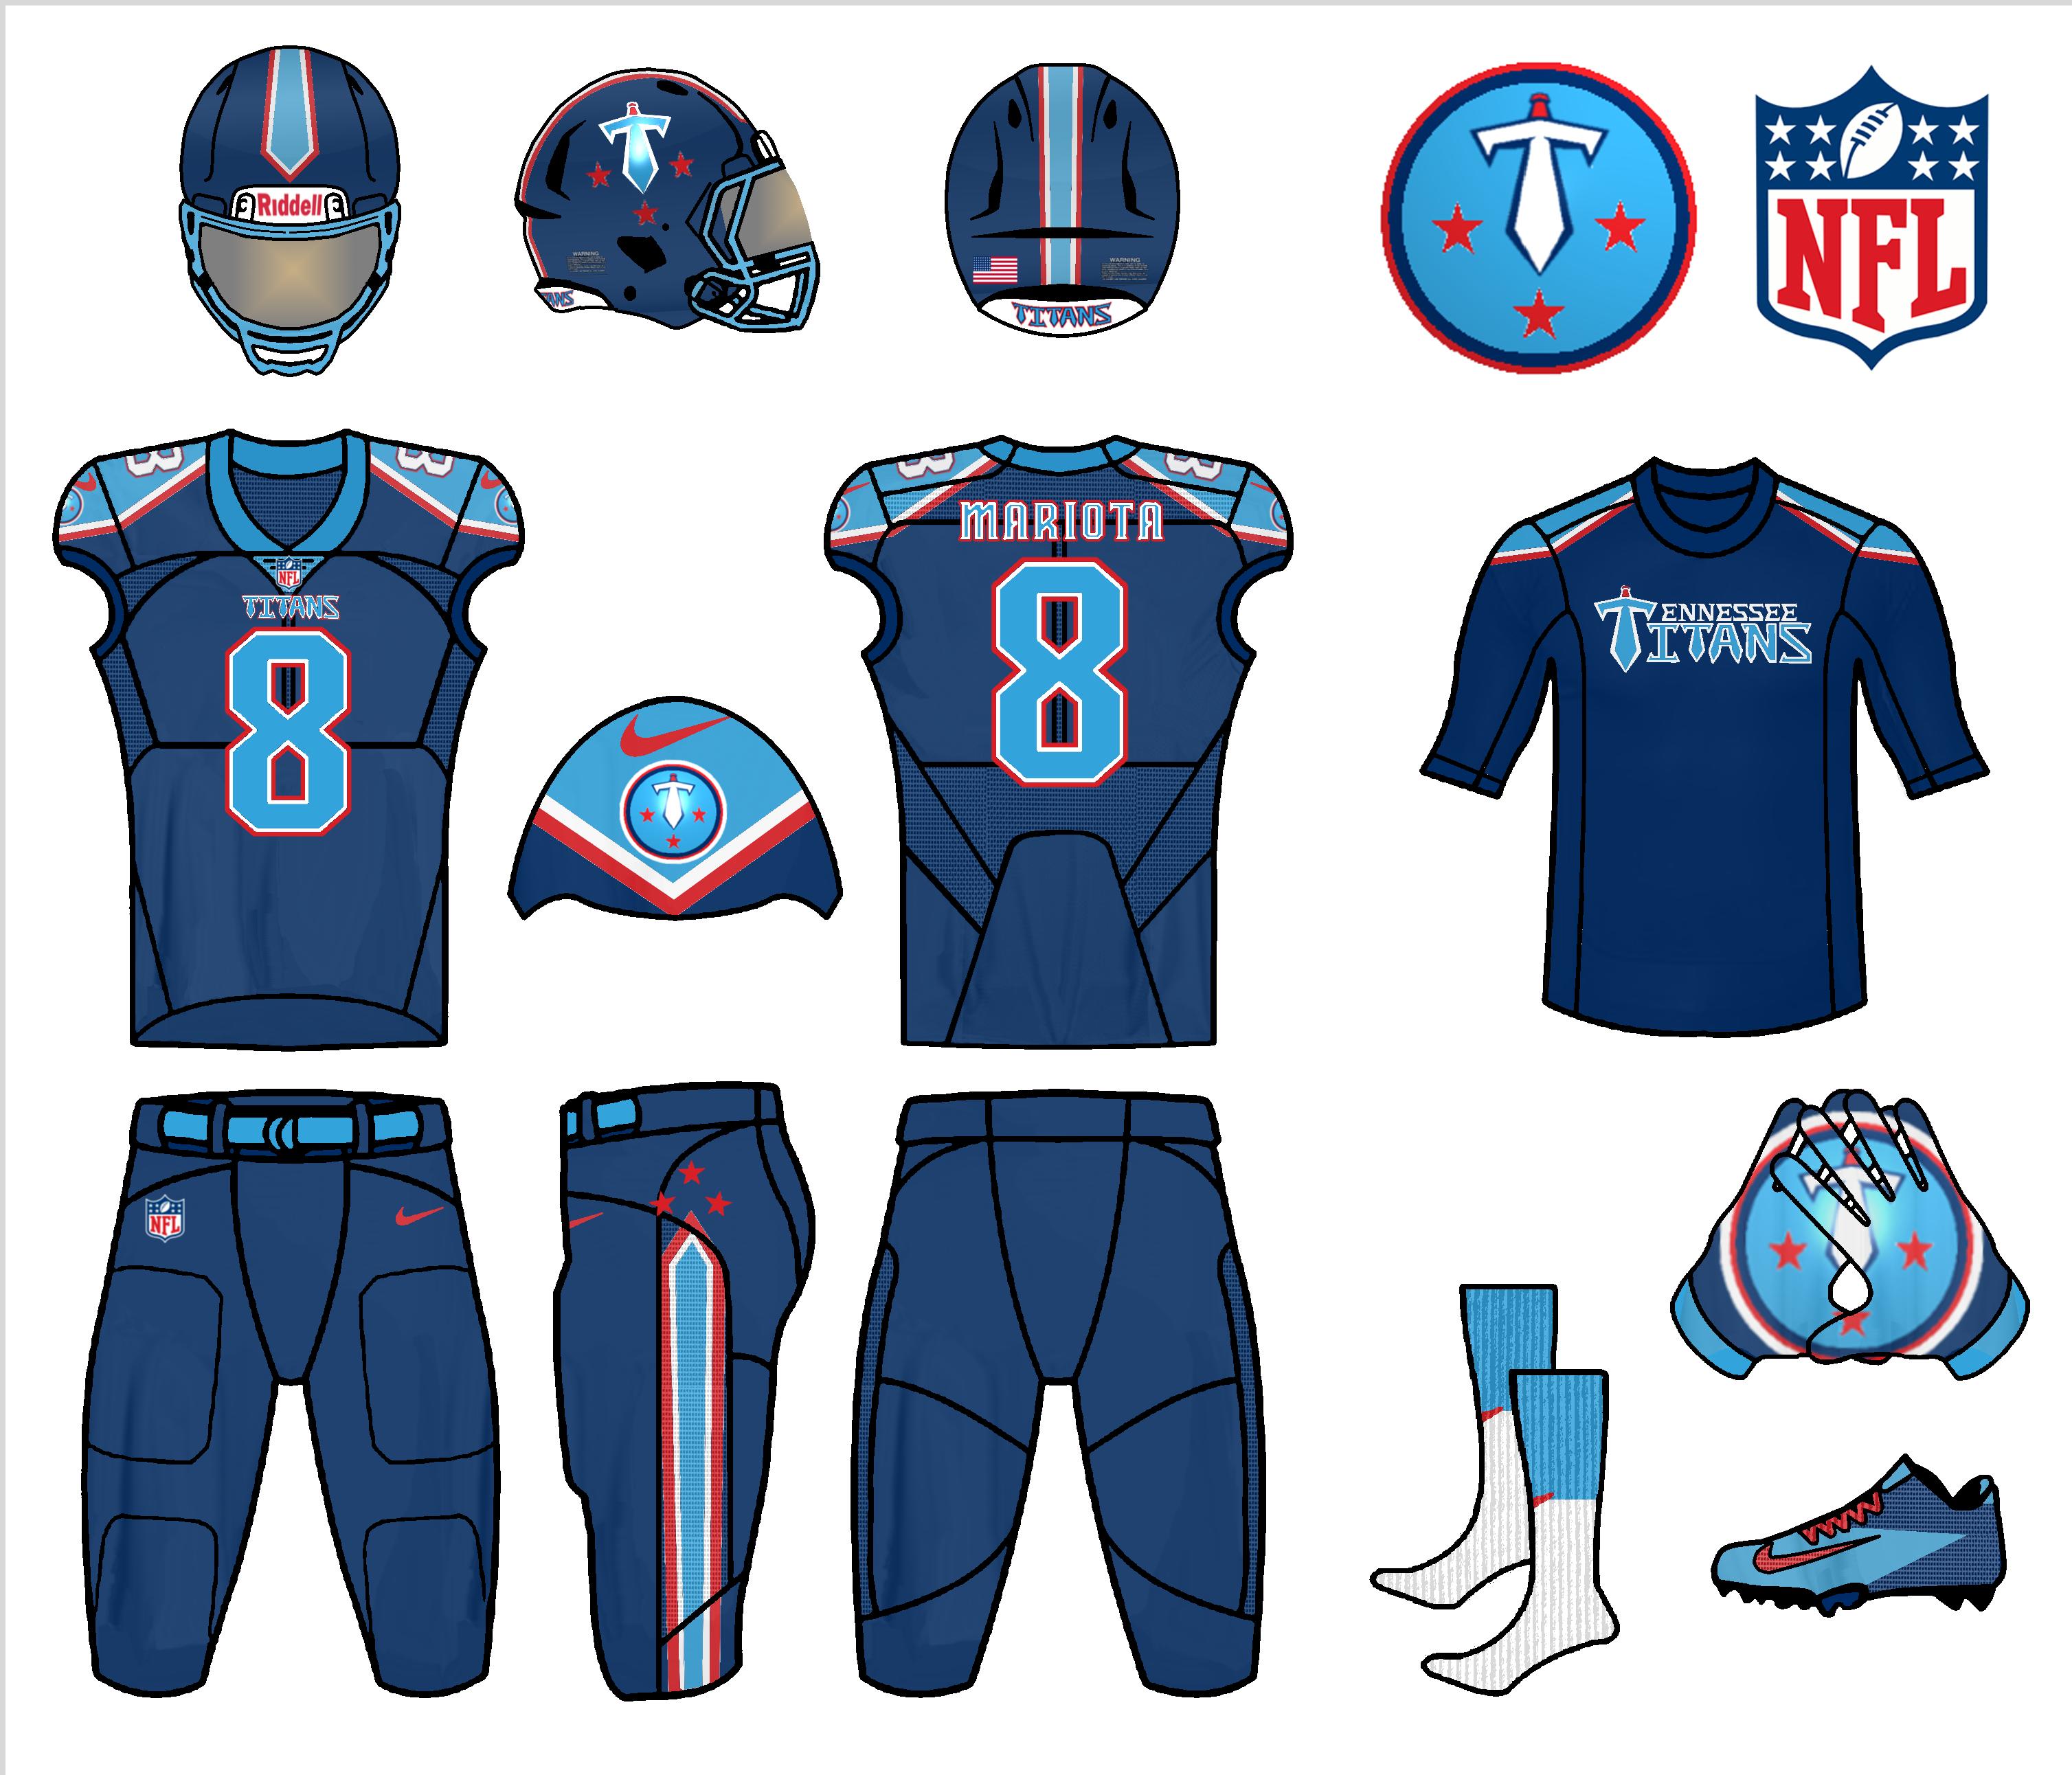 Tennessee_Titans_Alternate_Uniforms_2.pn